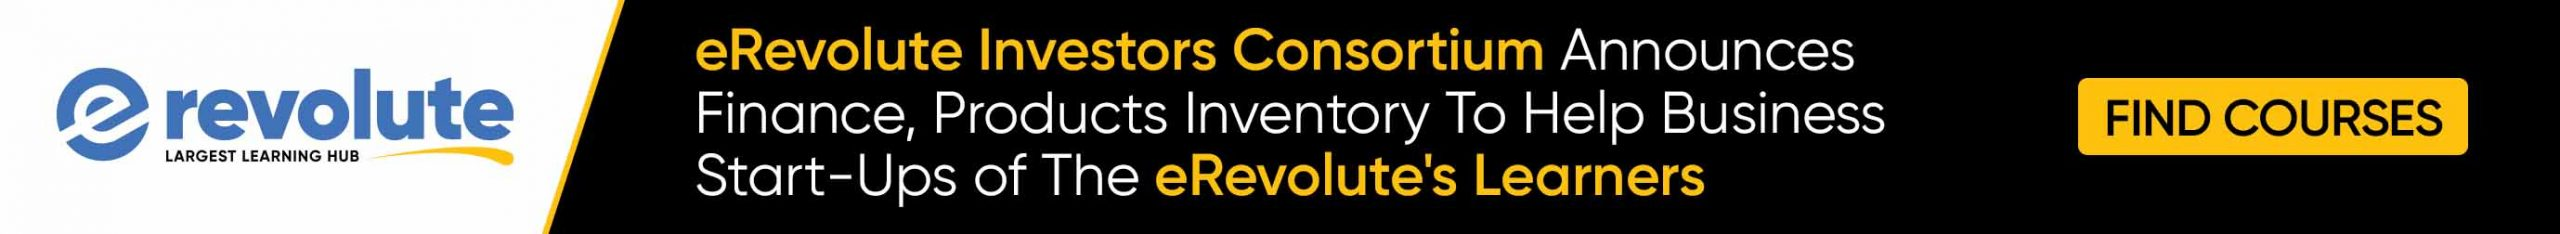 eRevoulte Amazon Courses